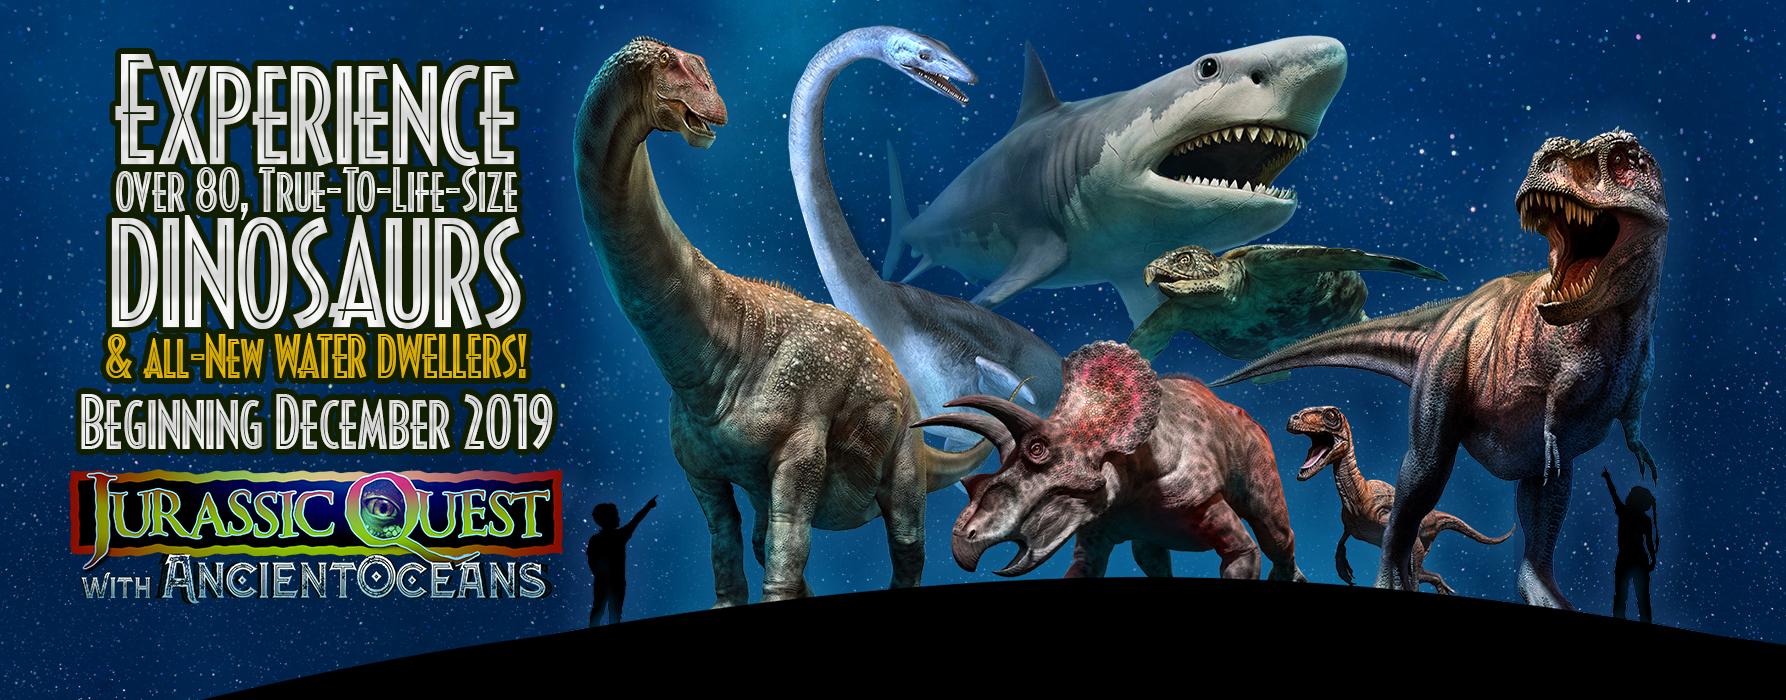 Ancient Oceans Image